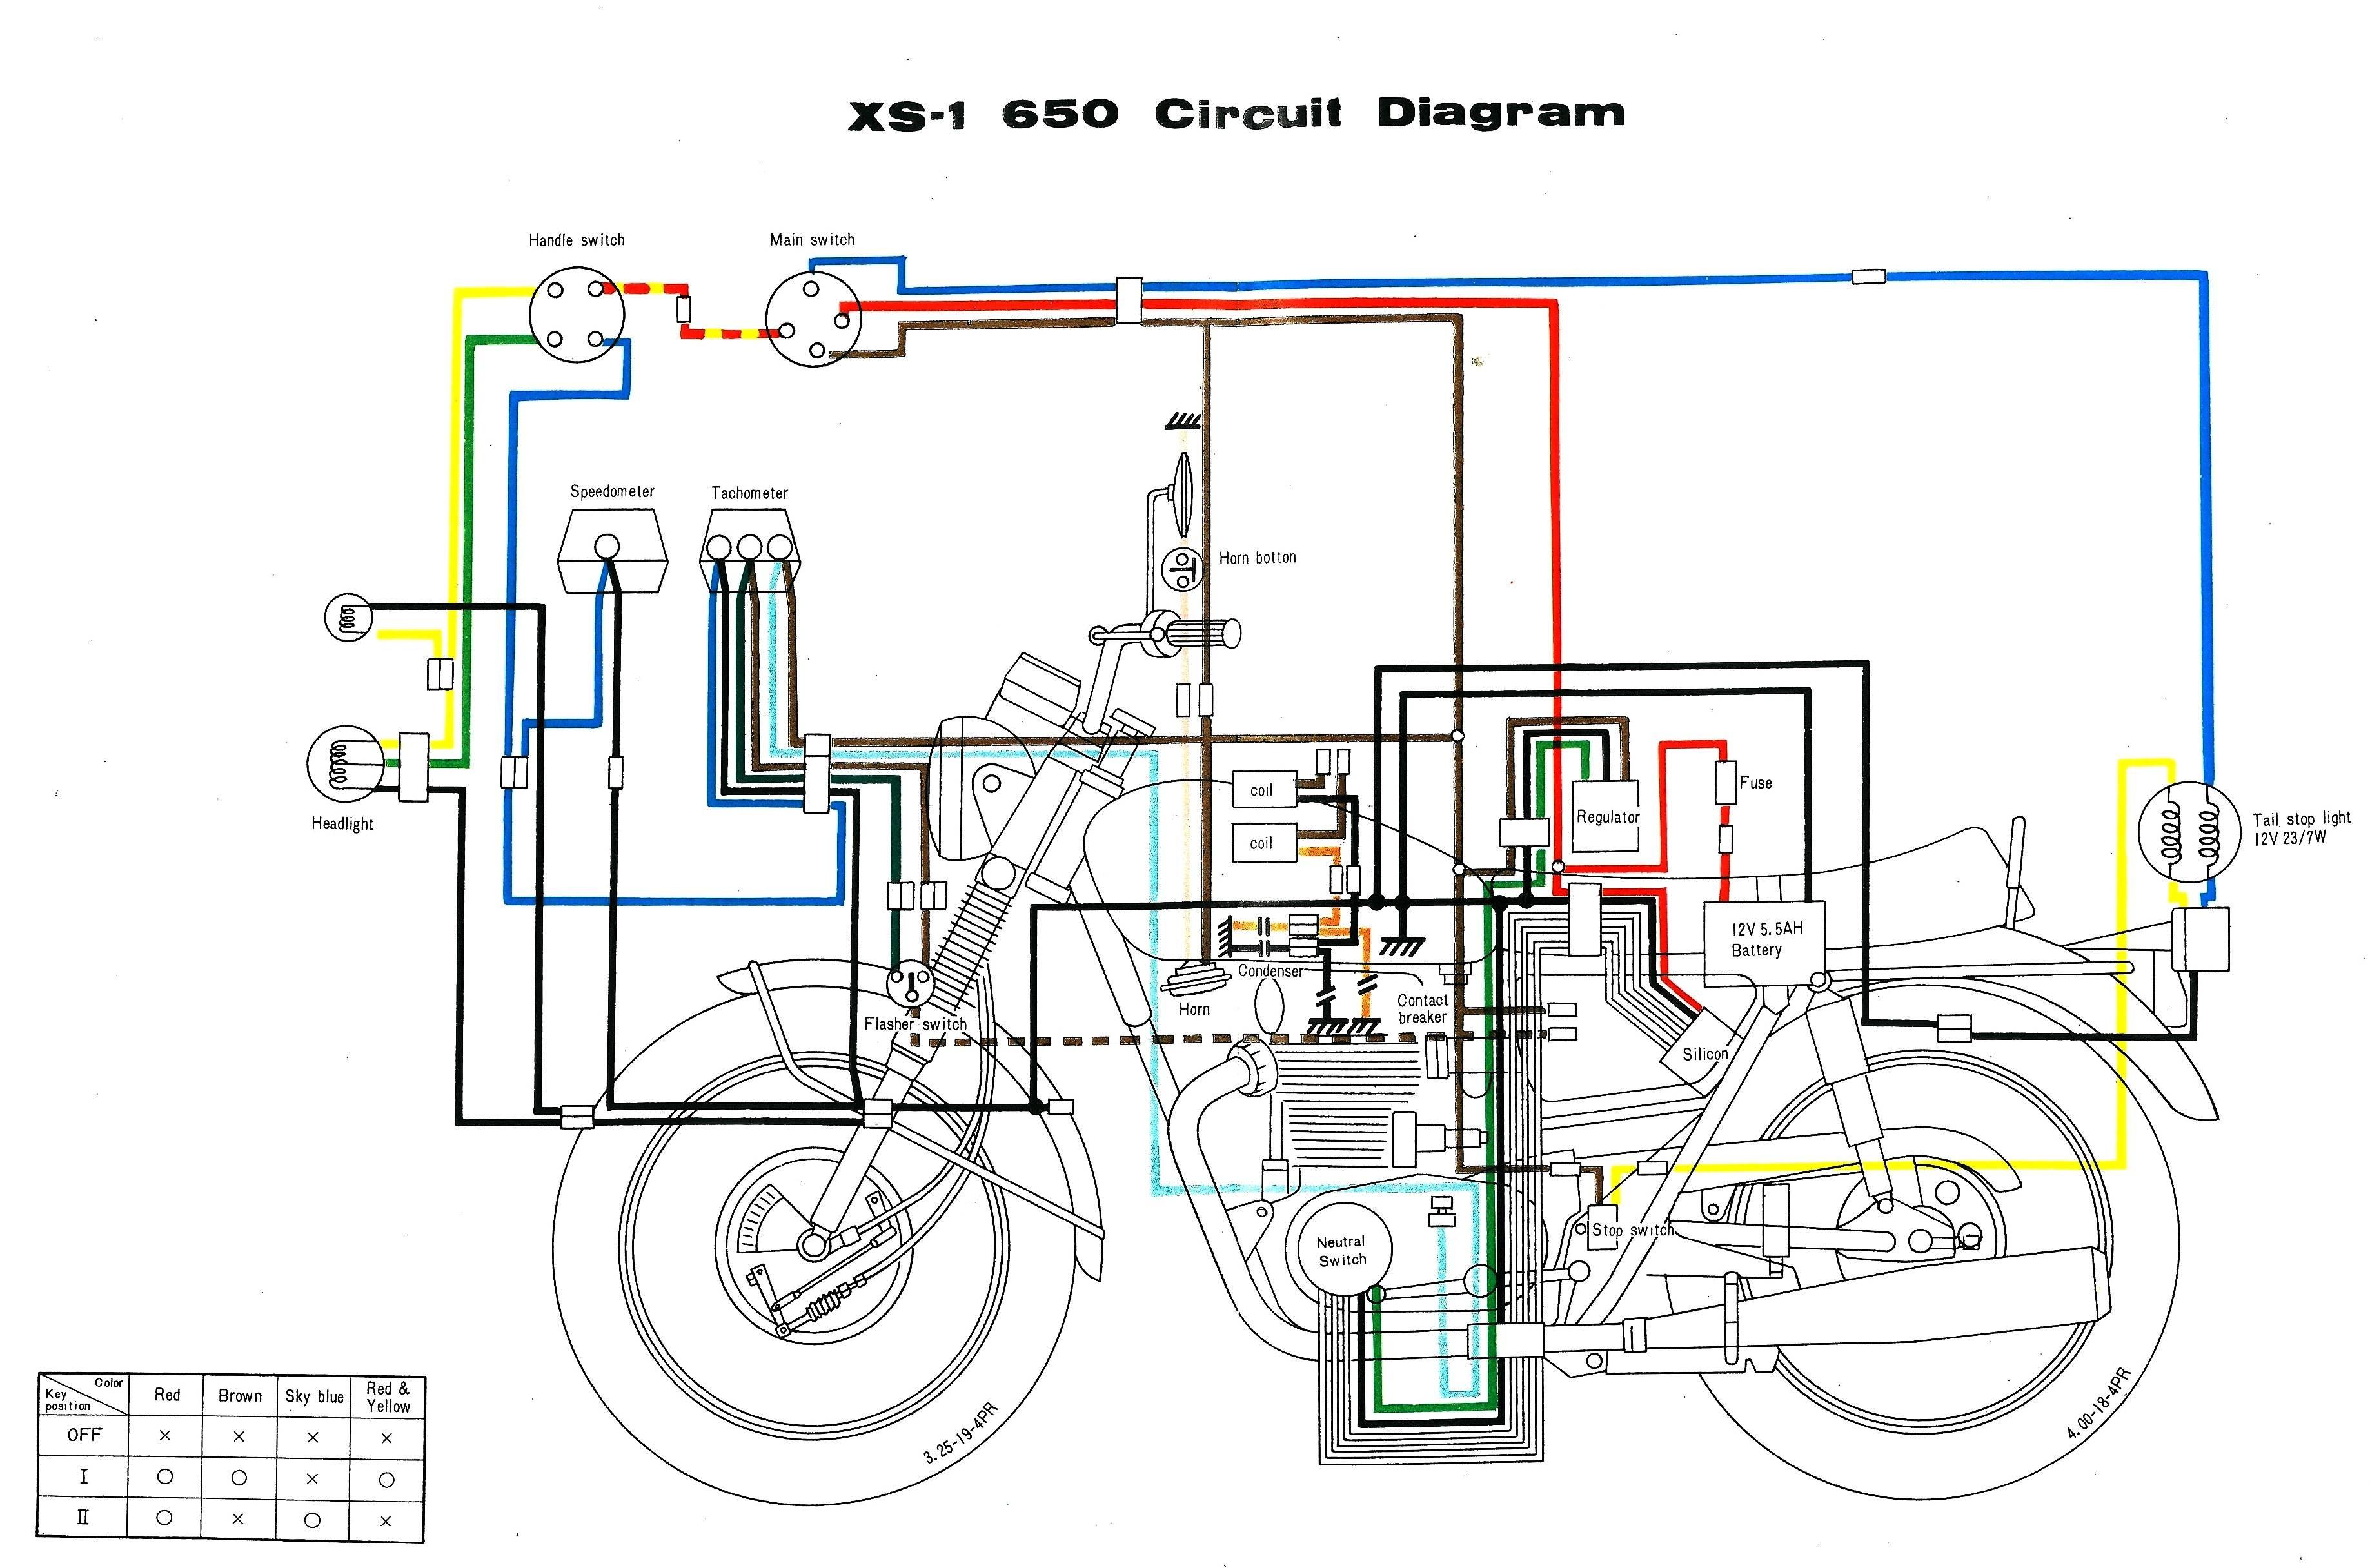 parable Wiring Diagrams enter image description here